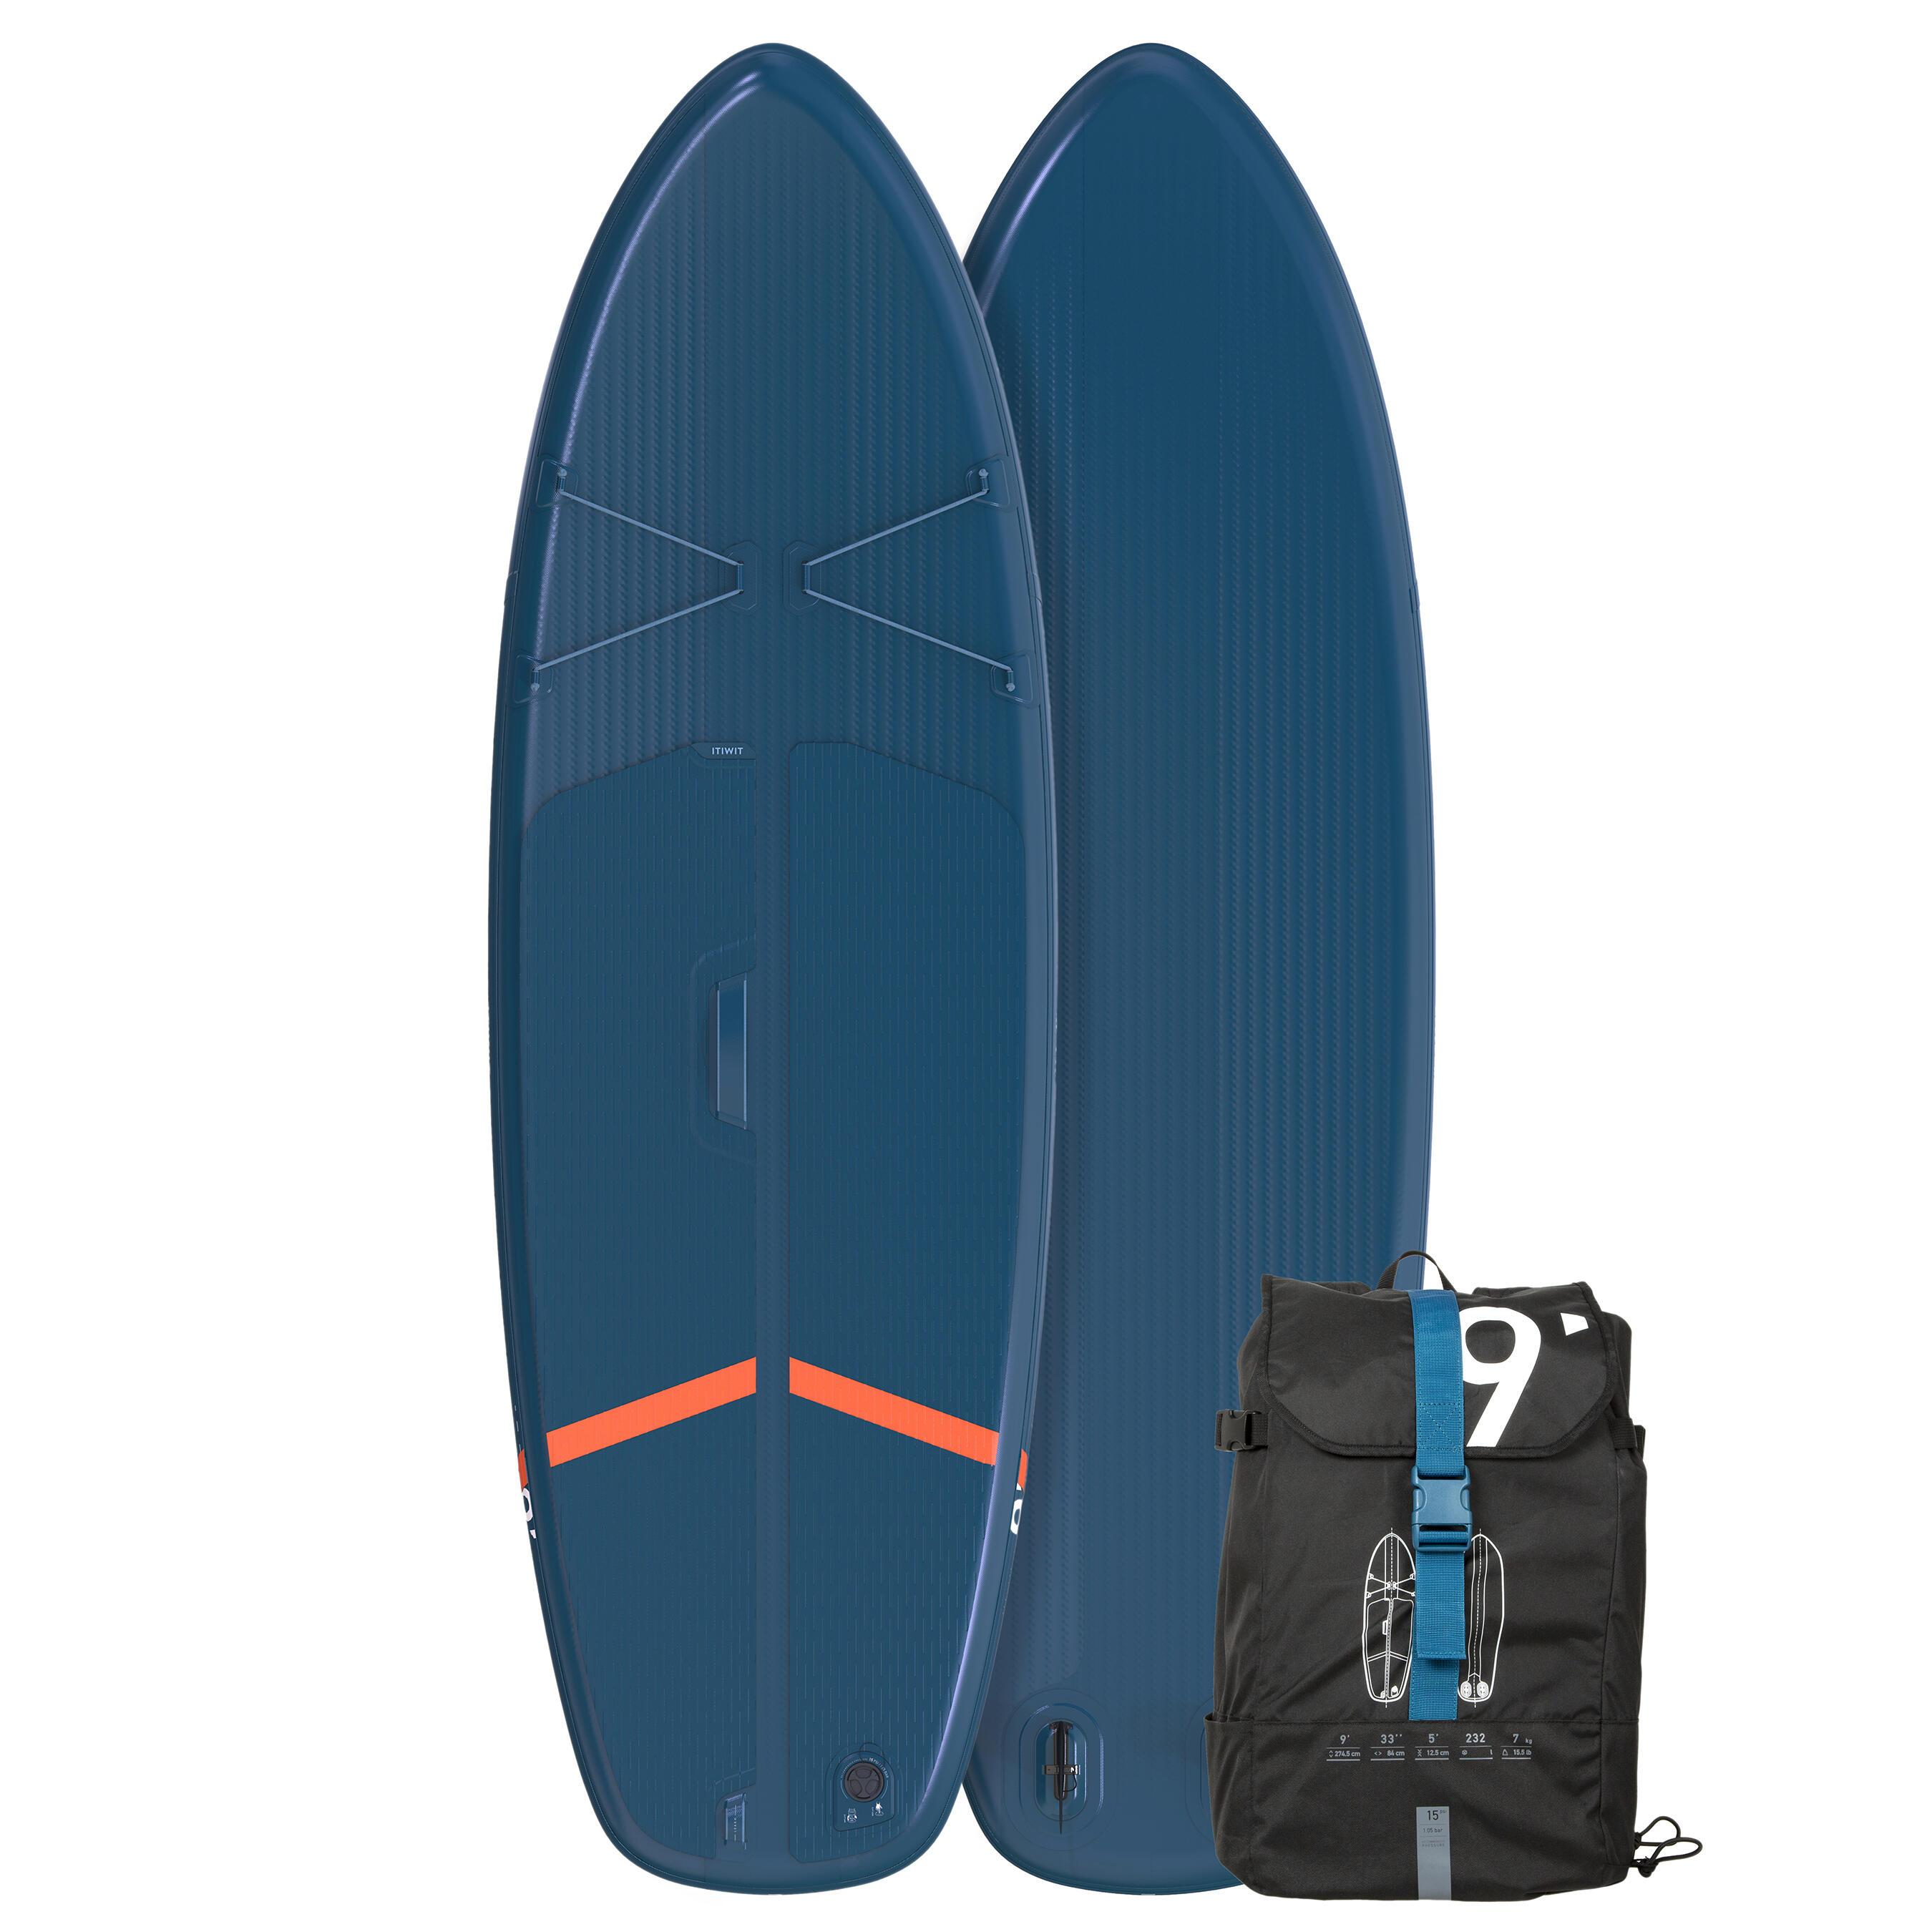 Itiwit - Decathlon SUP board